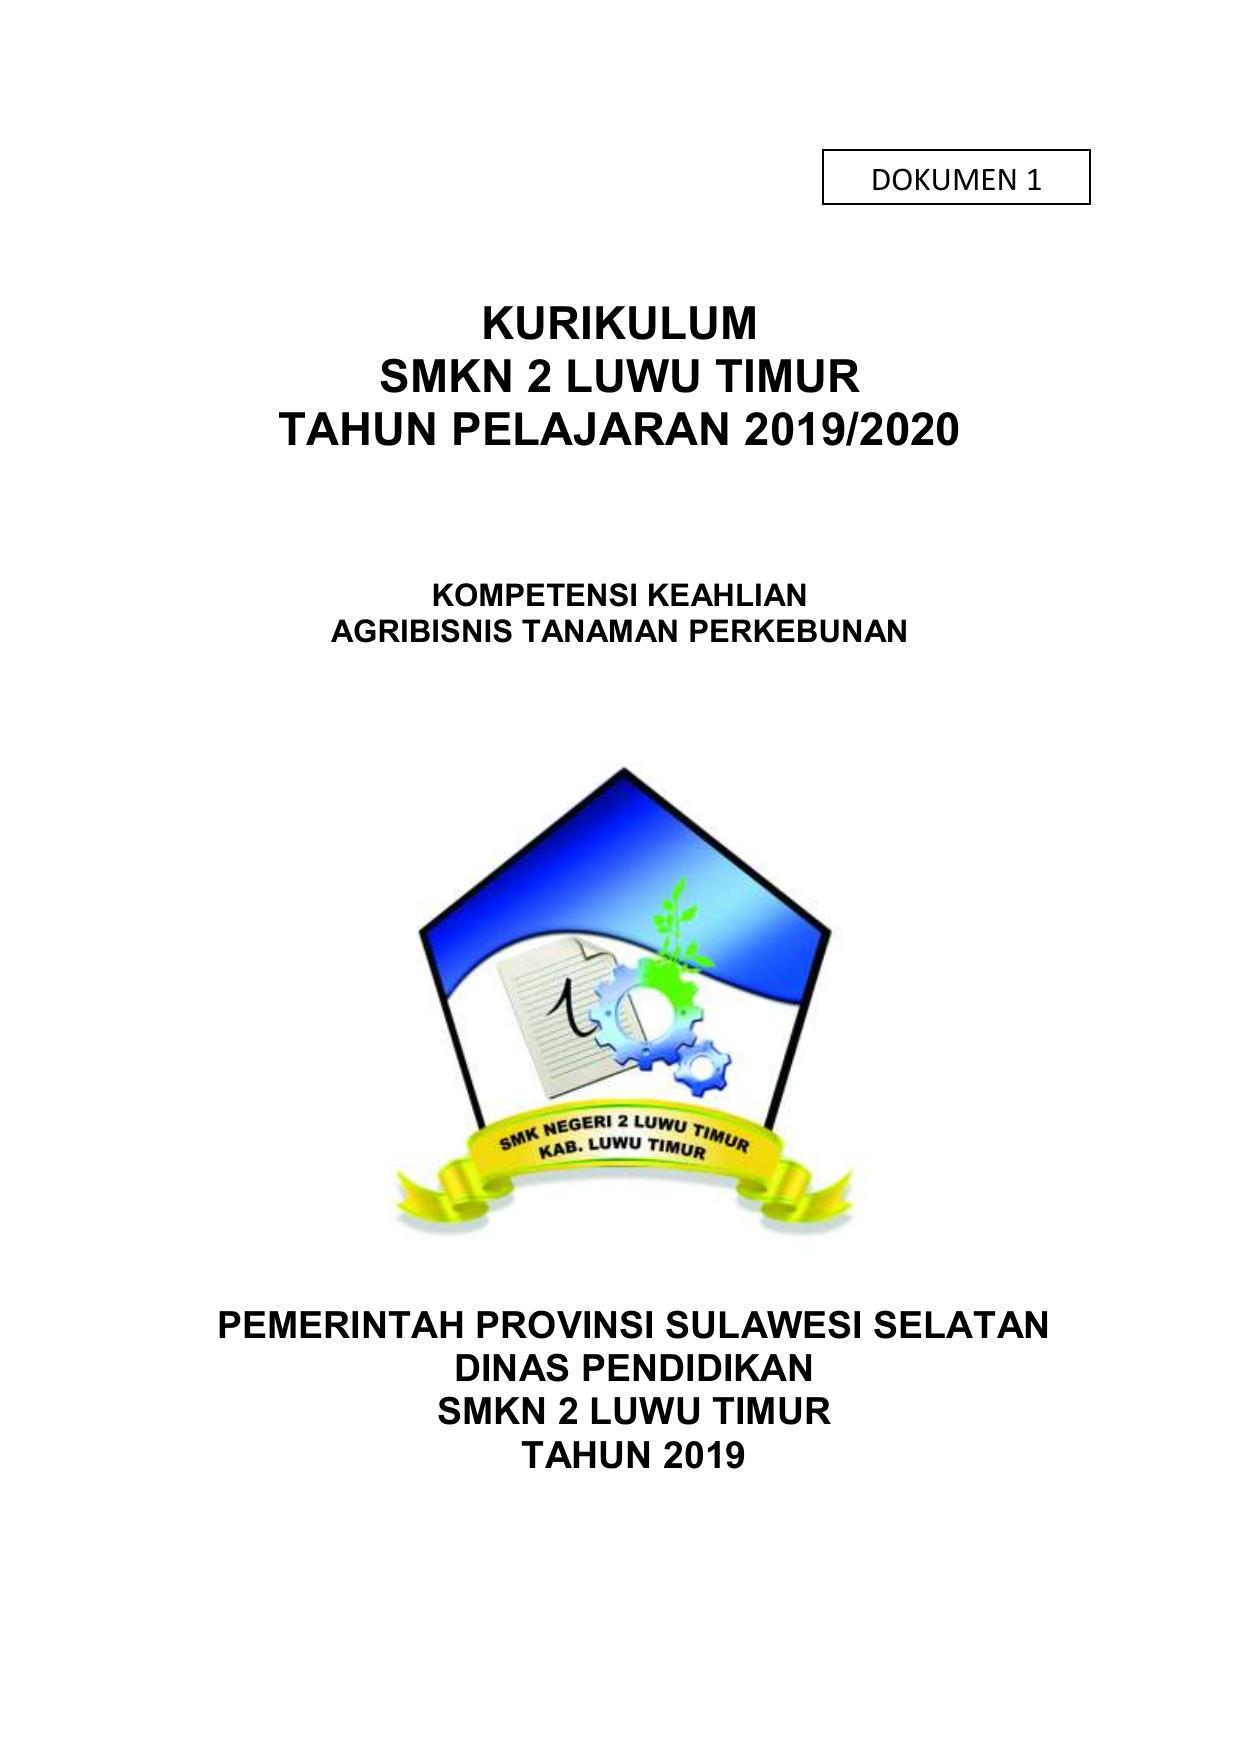 Dokumen I Jurusan Atp Smkn 2 Luwu Timur